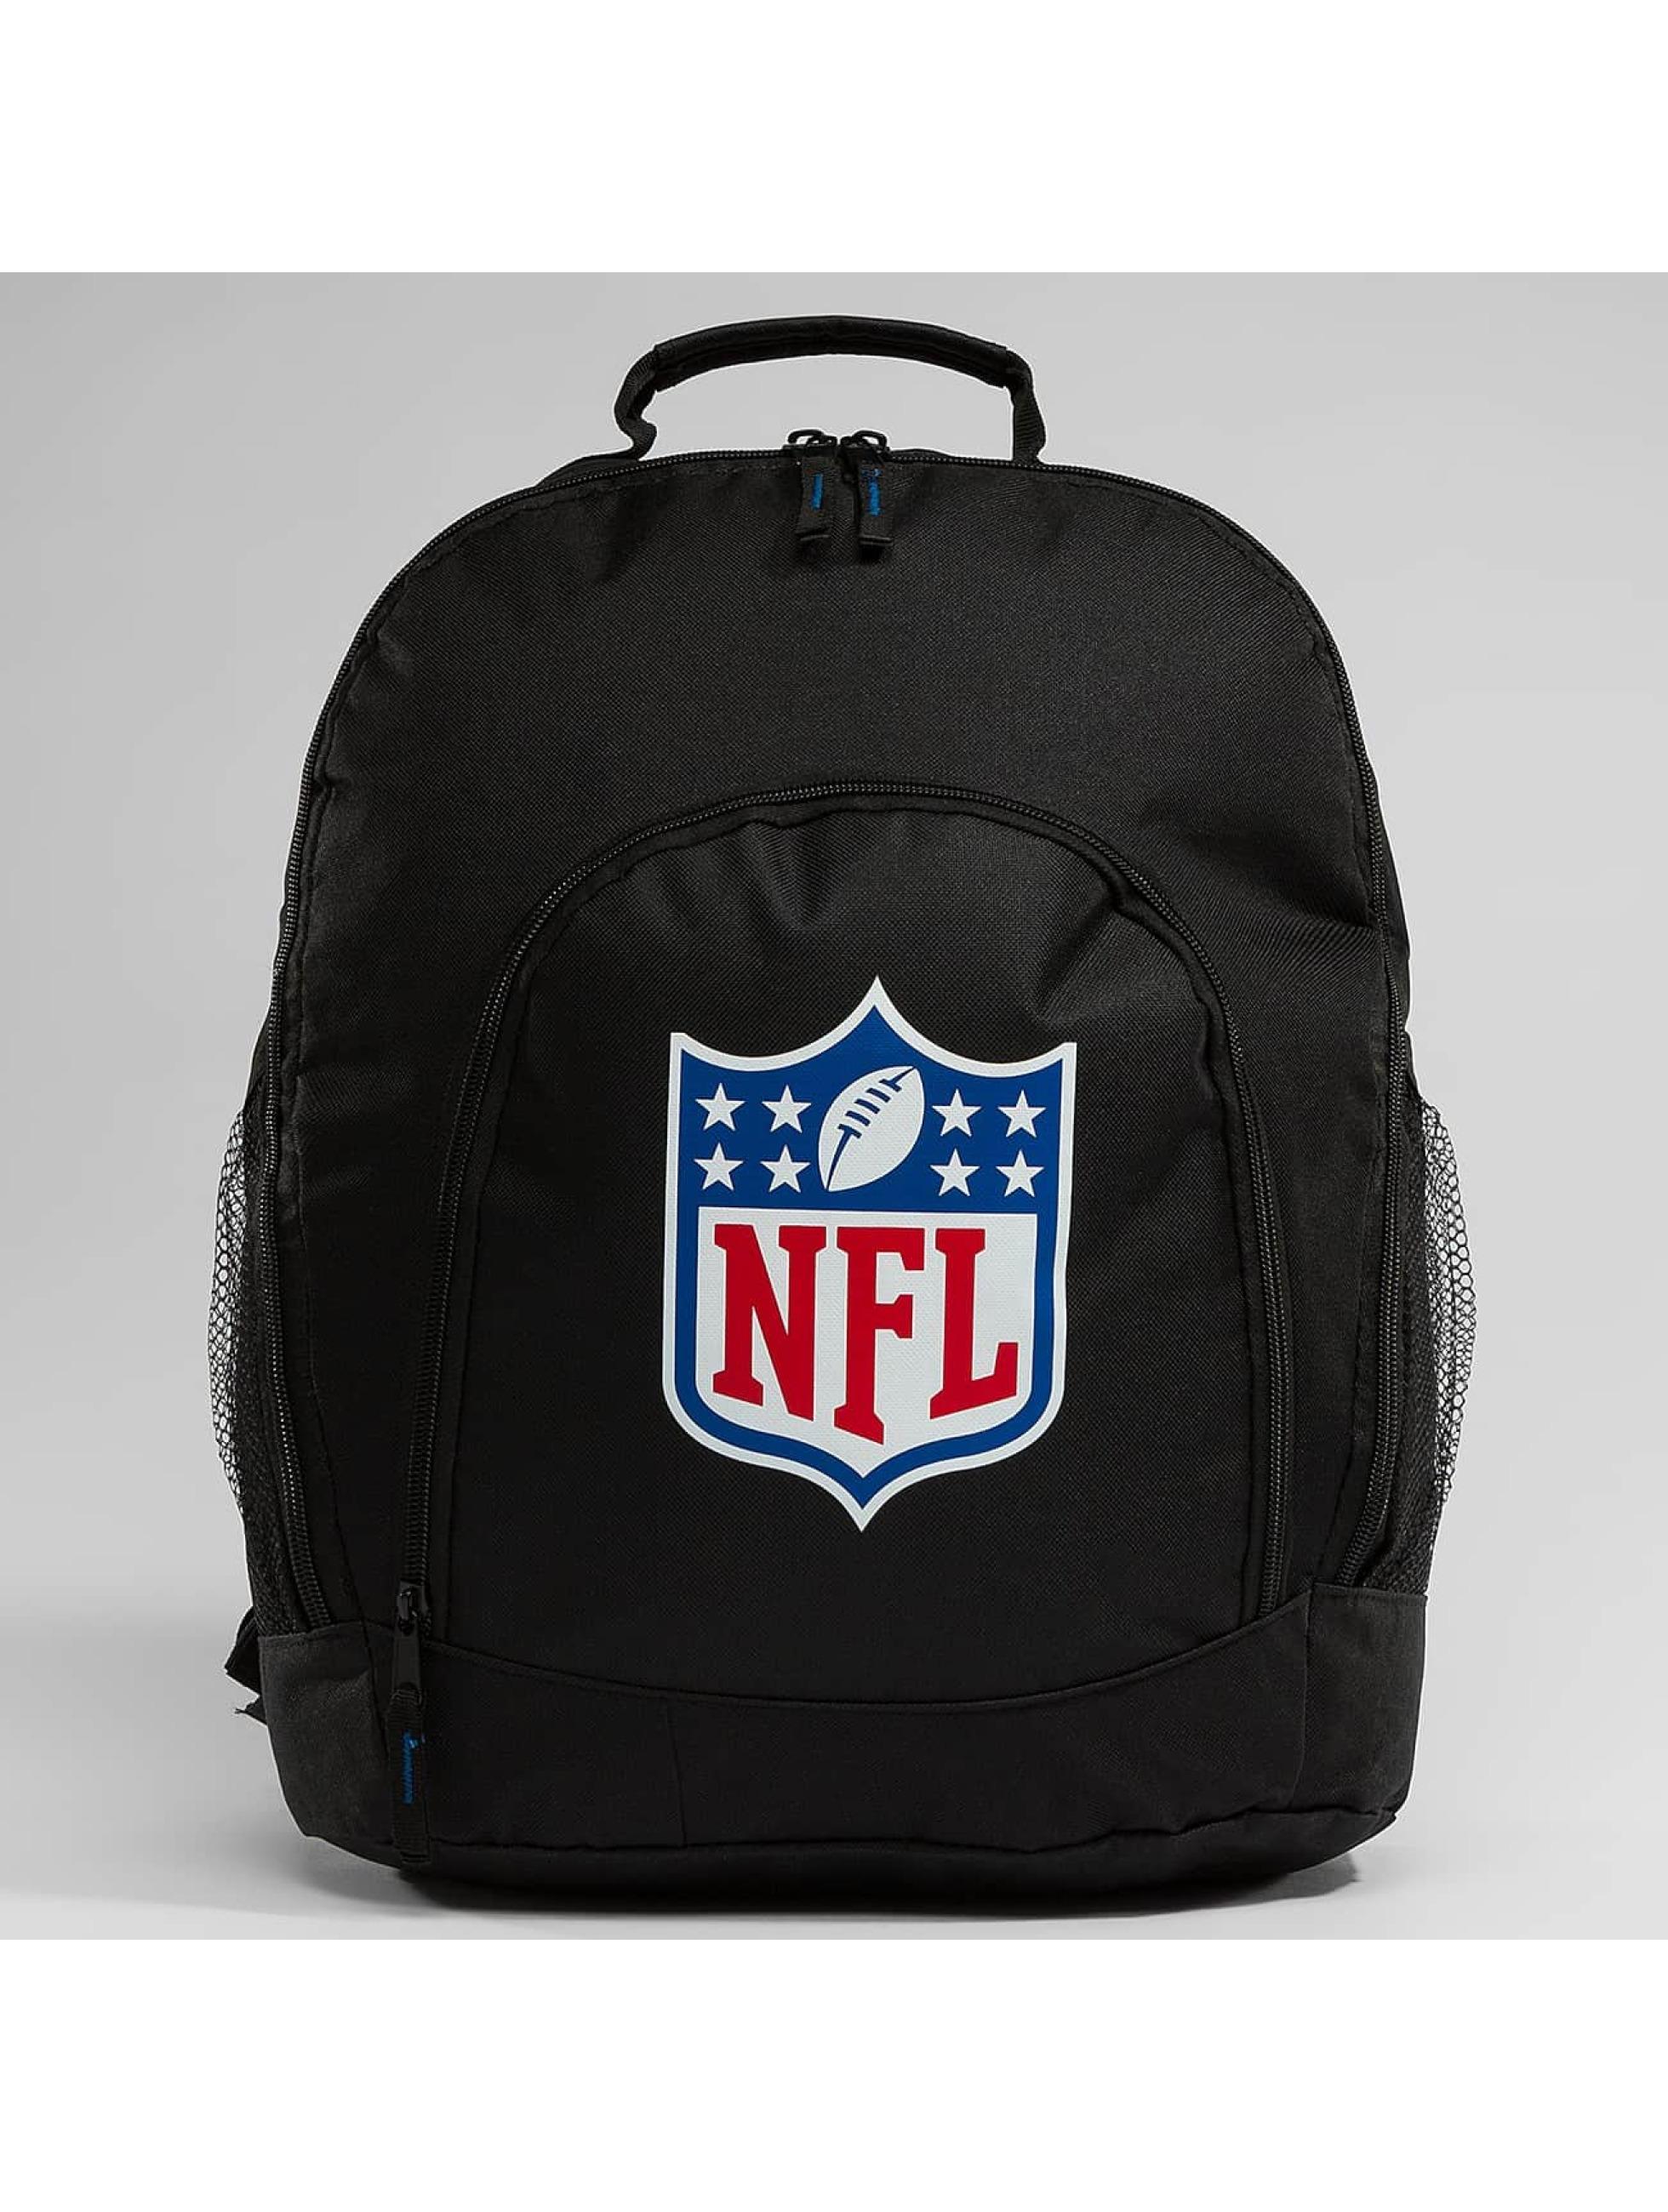 Forever Collectibles Rucksack NFL Logo schwarz